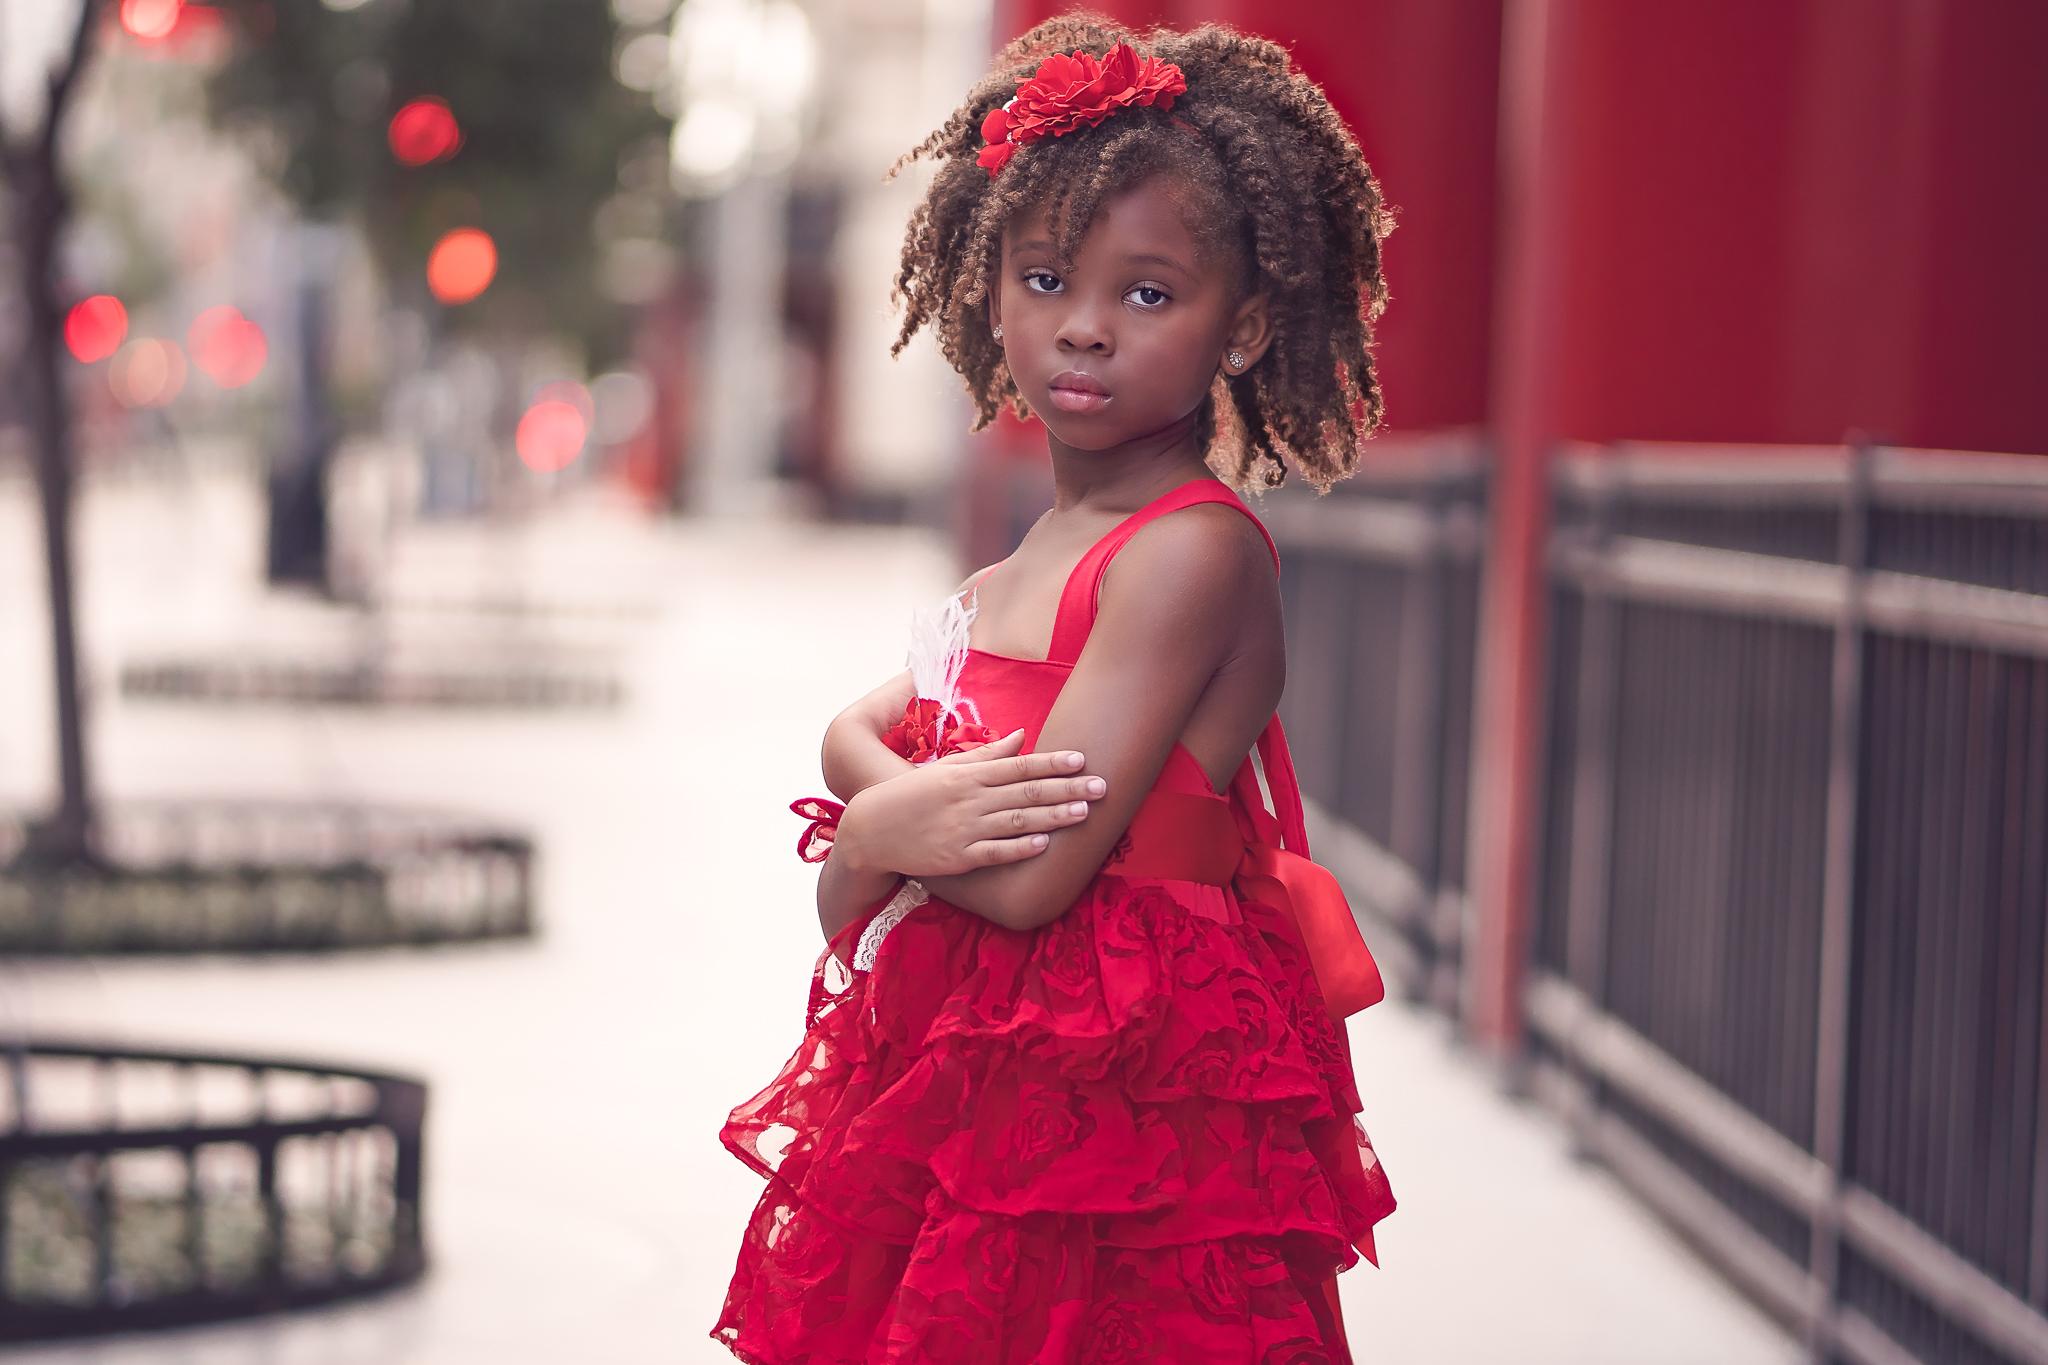 downtown-urban-princess-styled-photoshoot-houston-tx-katy-richmond-sugar-land-chilrens-photographer.jpg